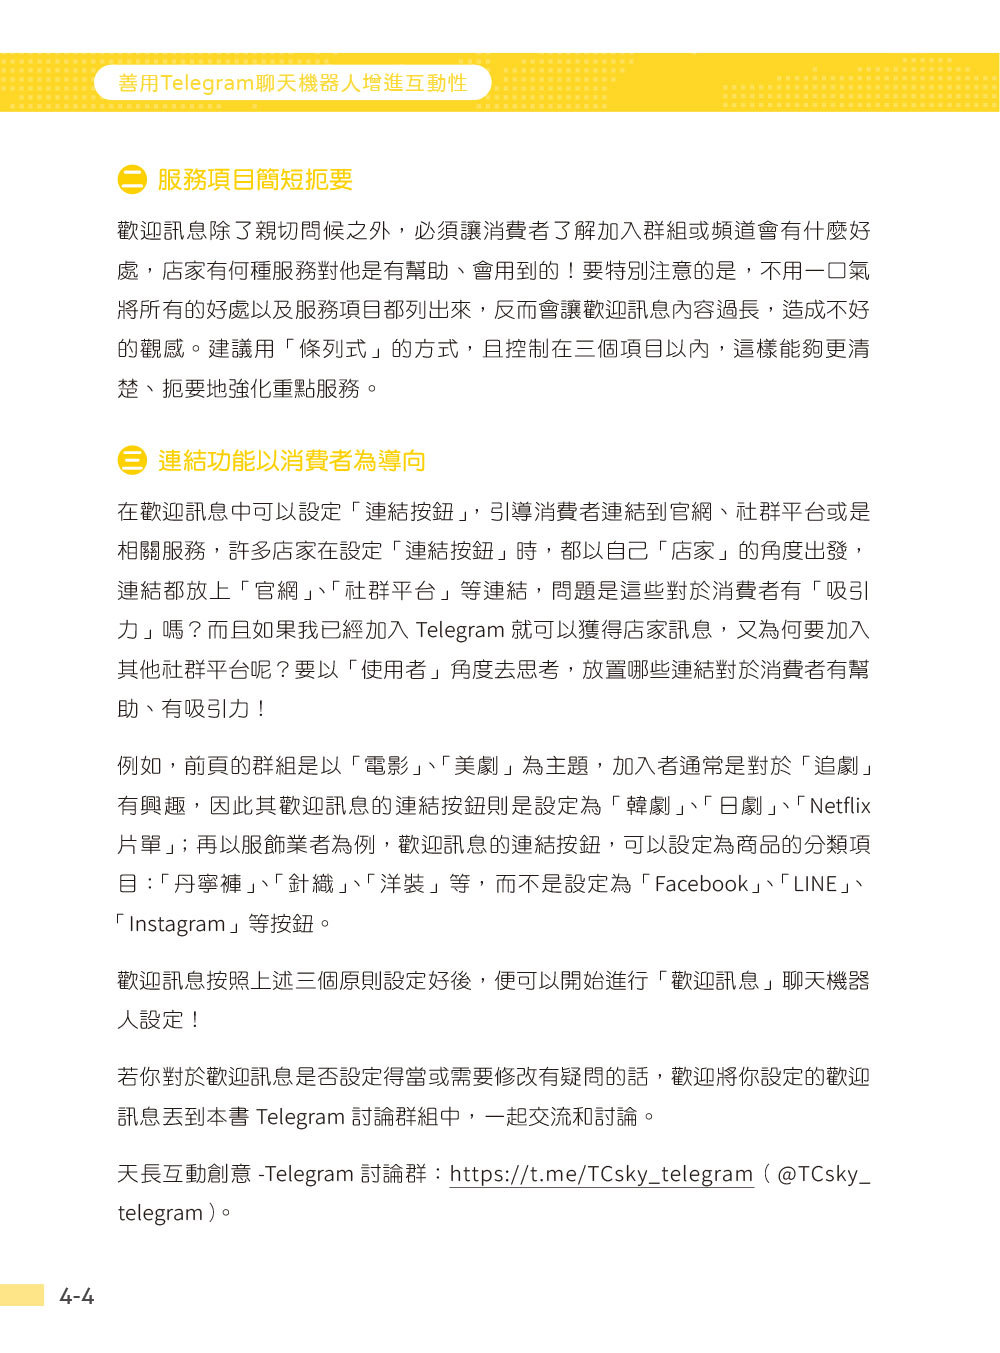 Telegram 行動行銷|操作技巧x品牌貼圖x經營心法-preview-9